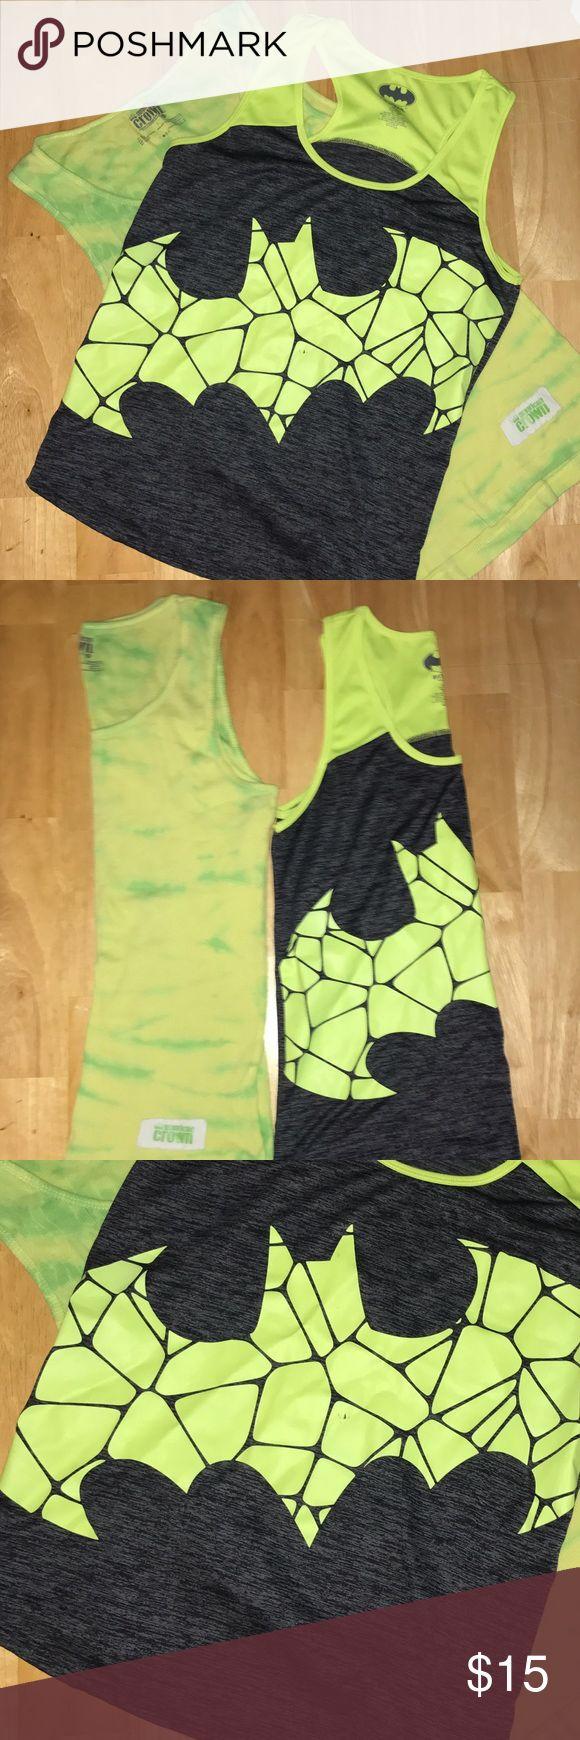 BOGO Batman ladies workout top and tie dye tank BOGO dri-fit ladies black and neon green workout top and tie dye green tank Tops Tank Tops